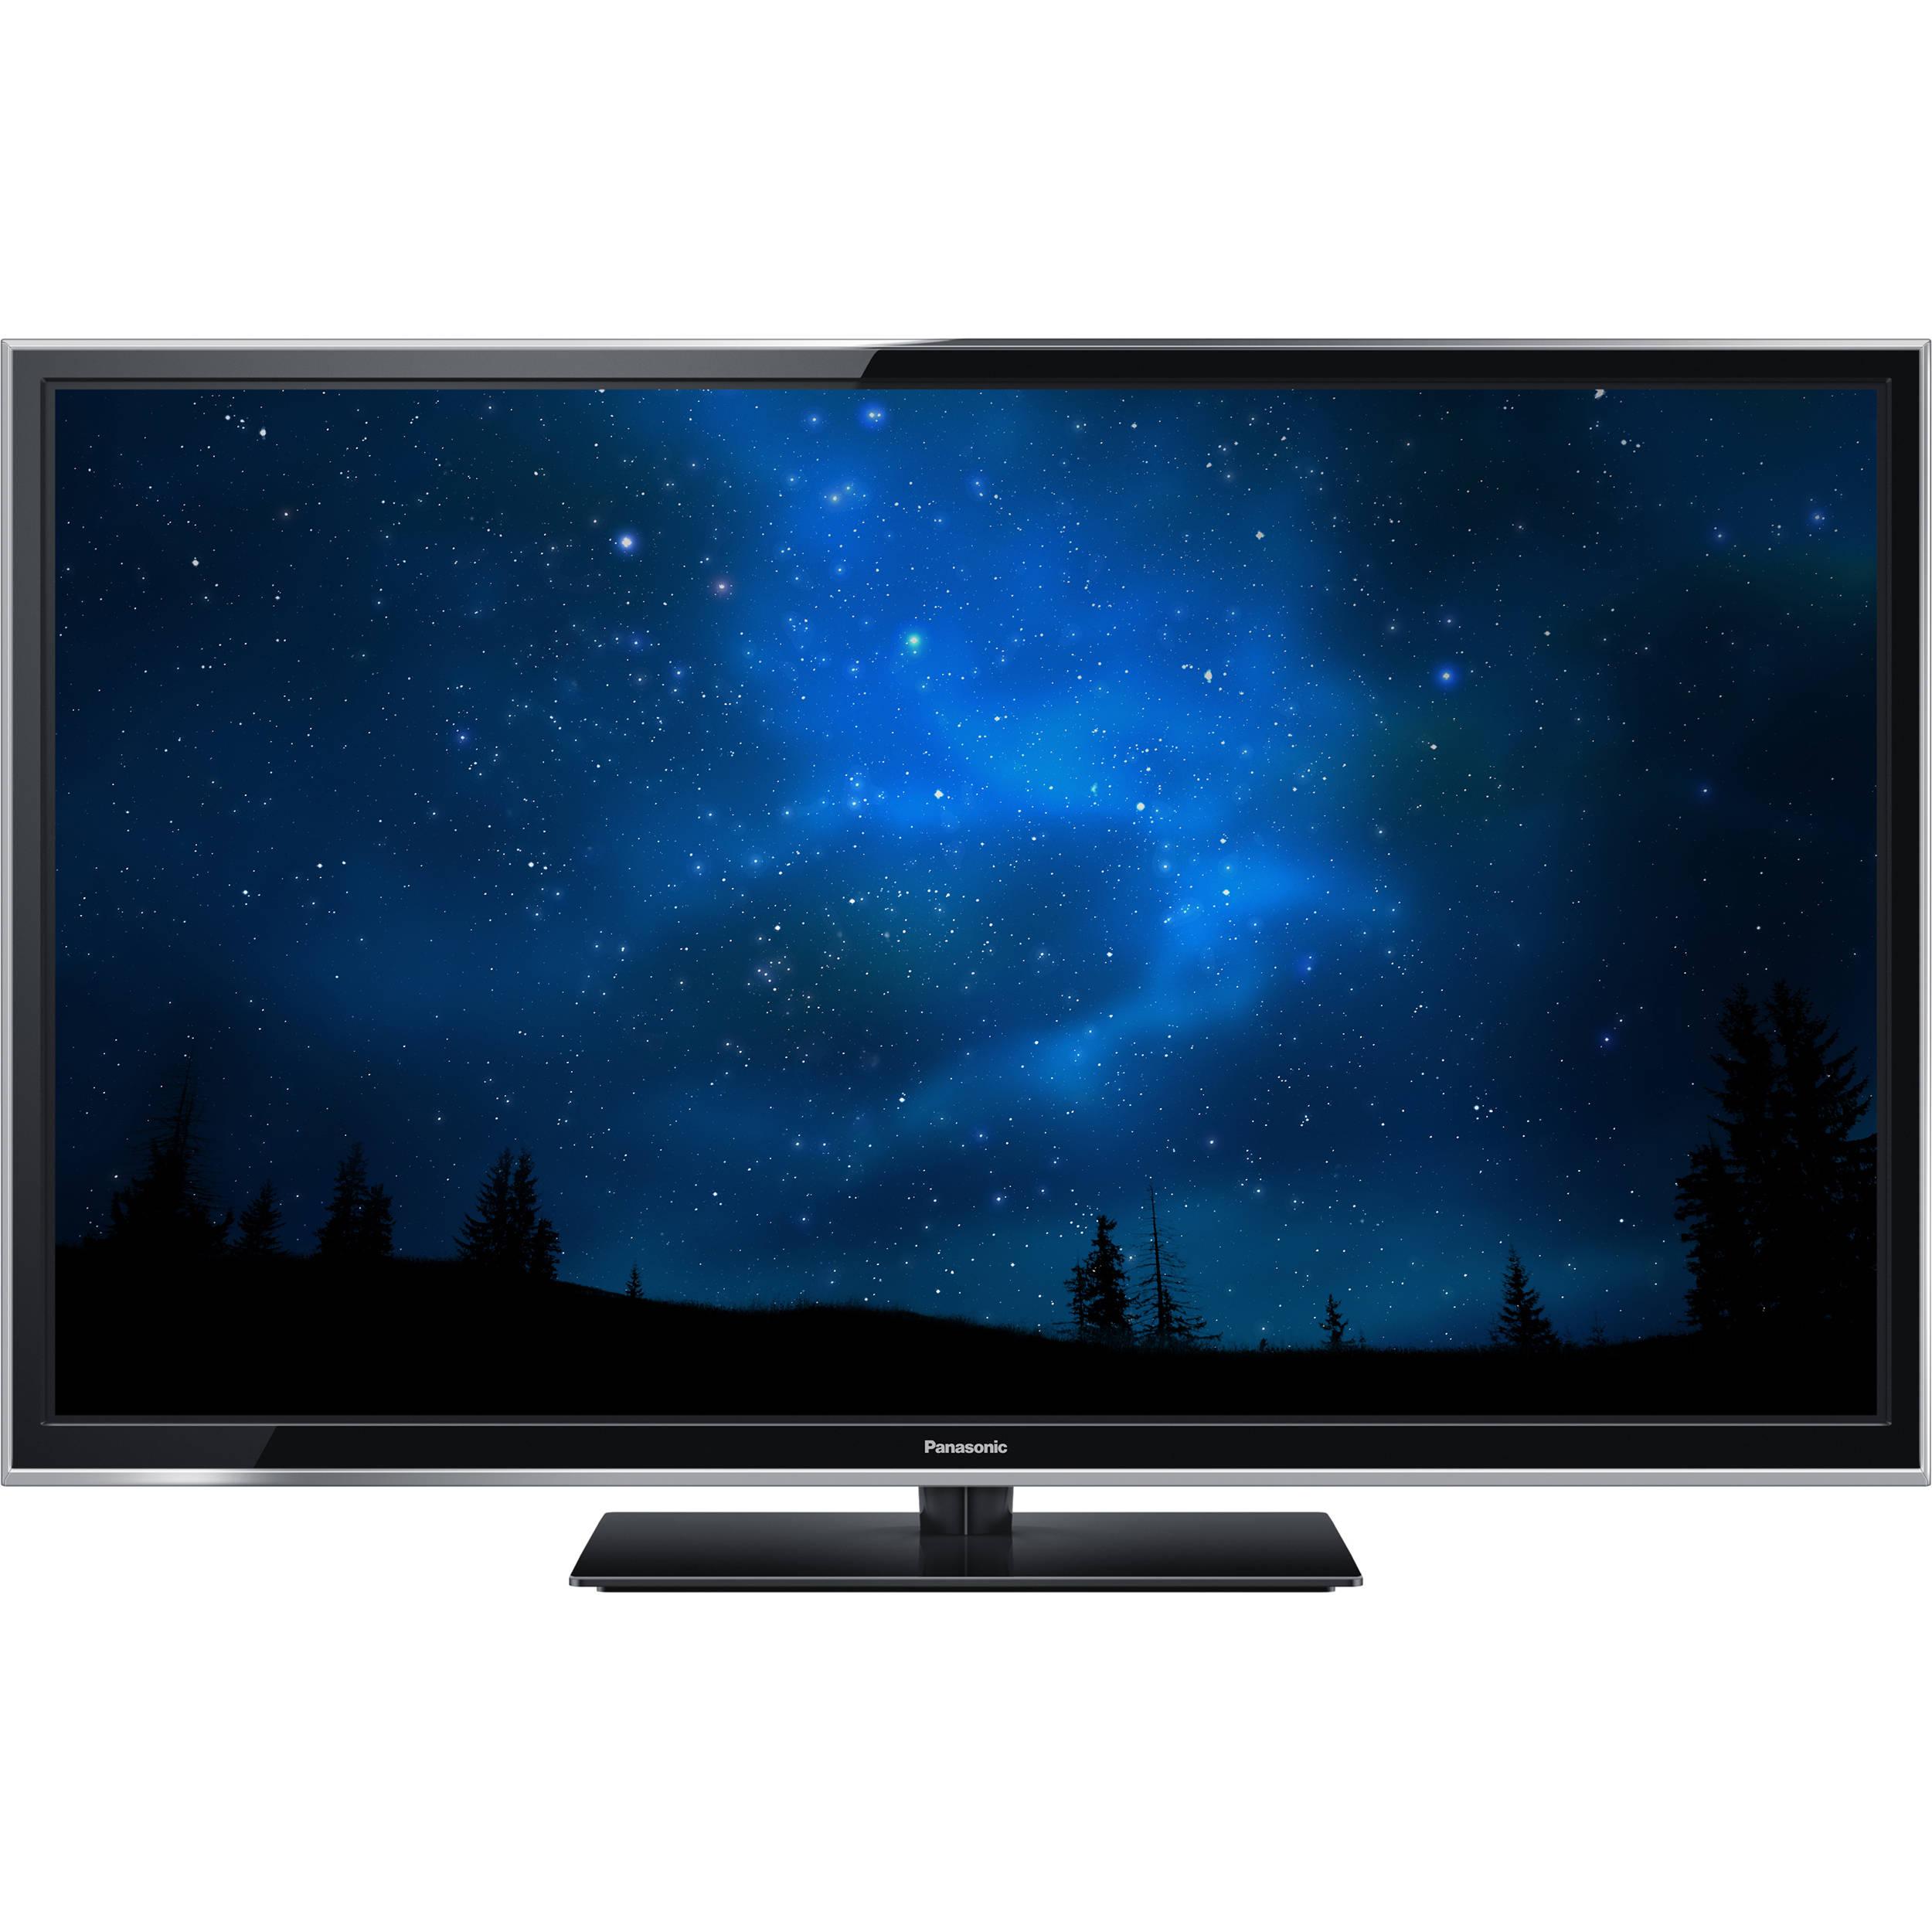 PANASONIC UHD DIGITAL Smart TV 4K รุ่น TH-50FS500T ขนาด 50 นิ้ว